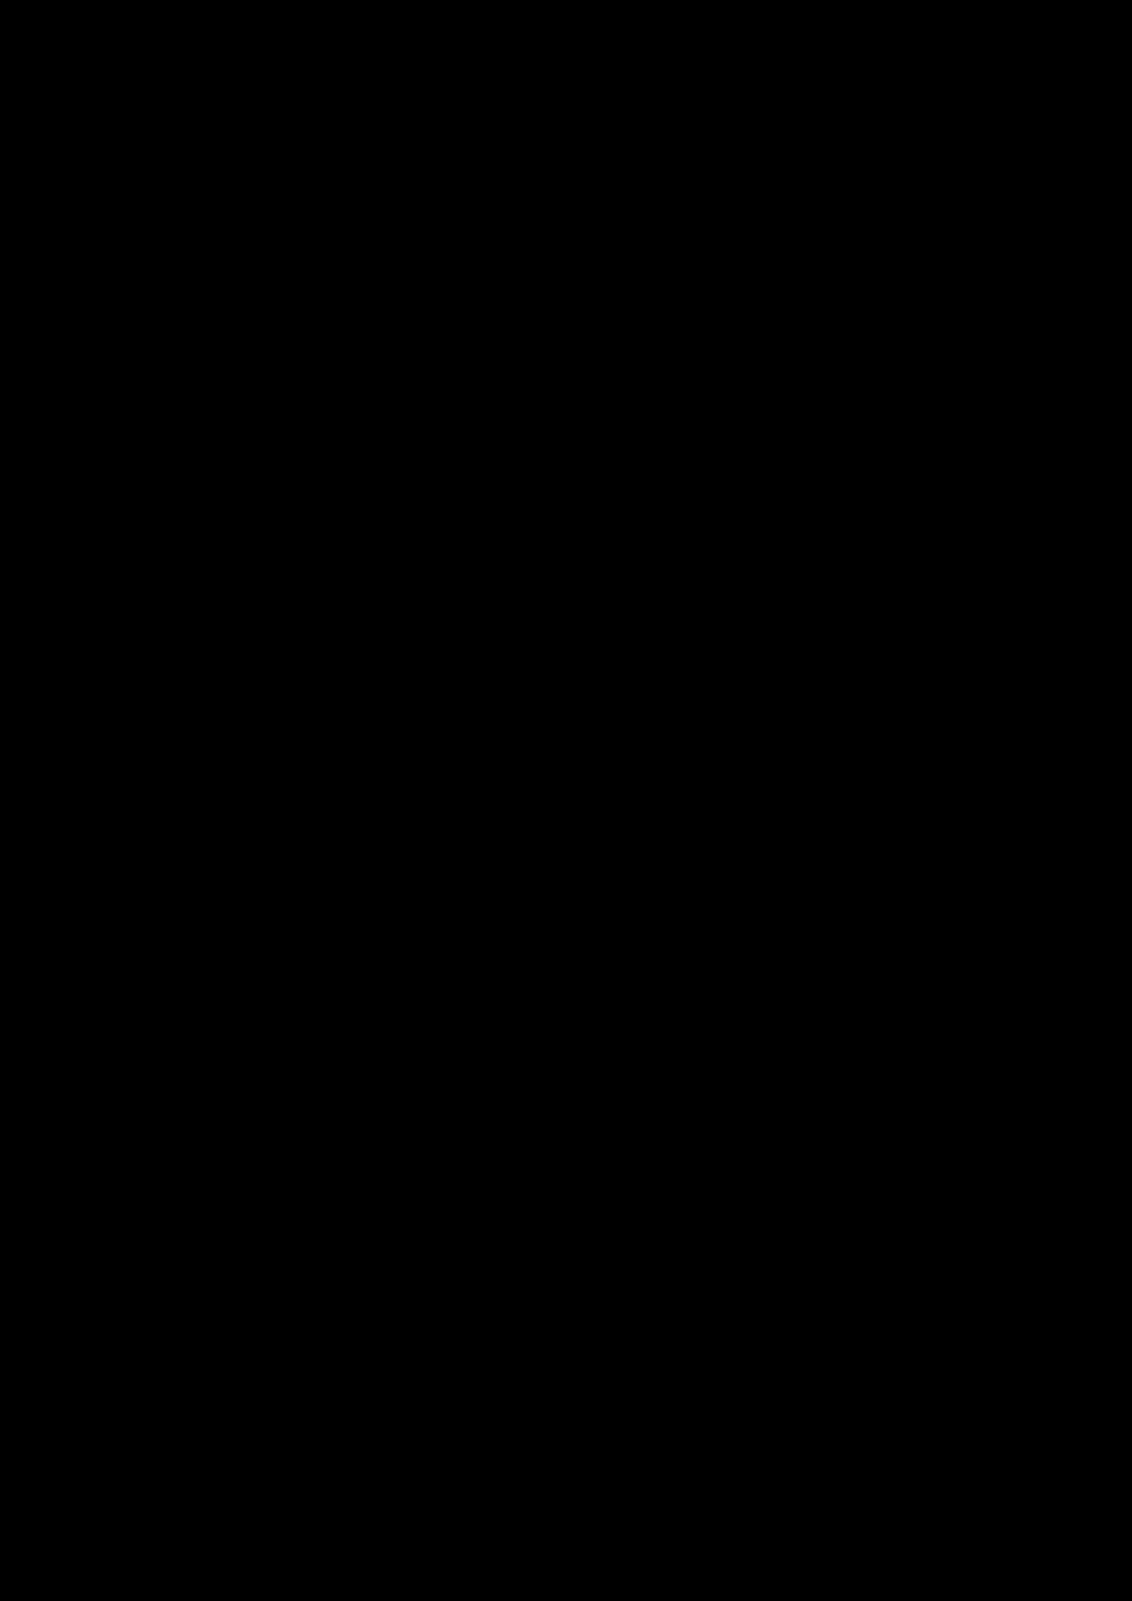 18 berez slide, Image 24